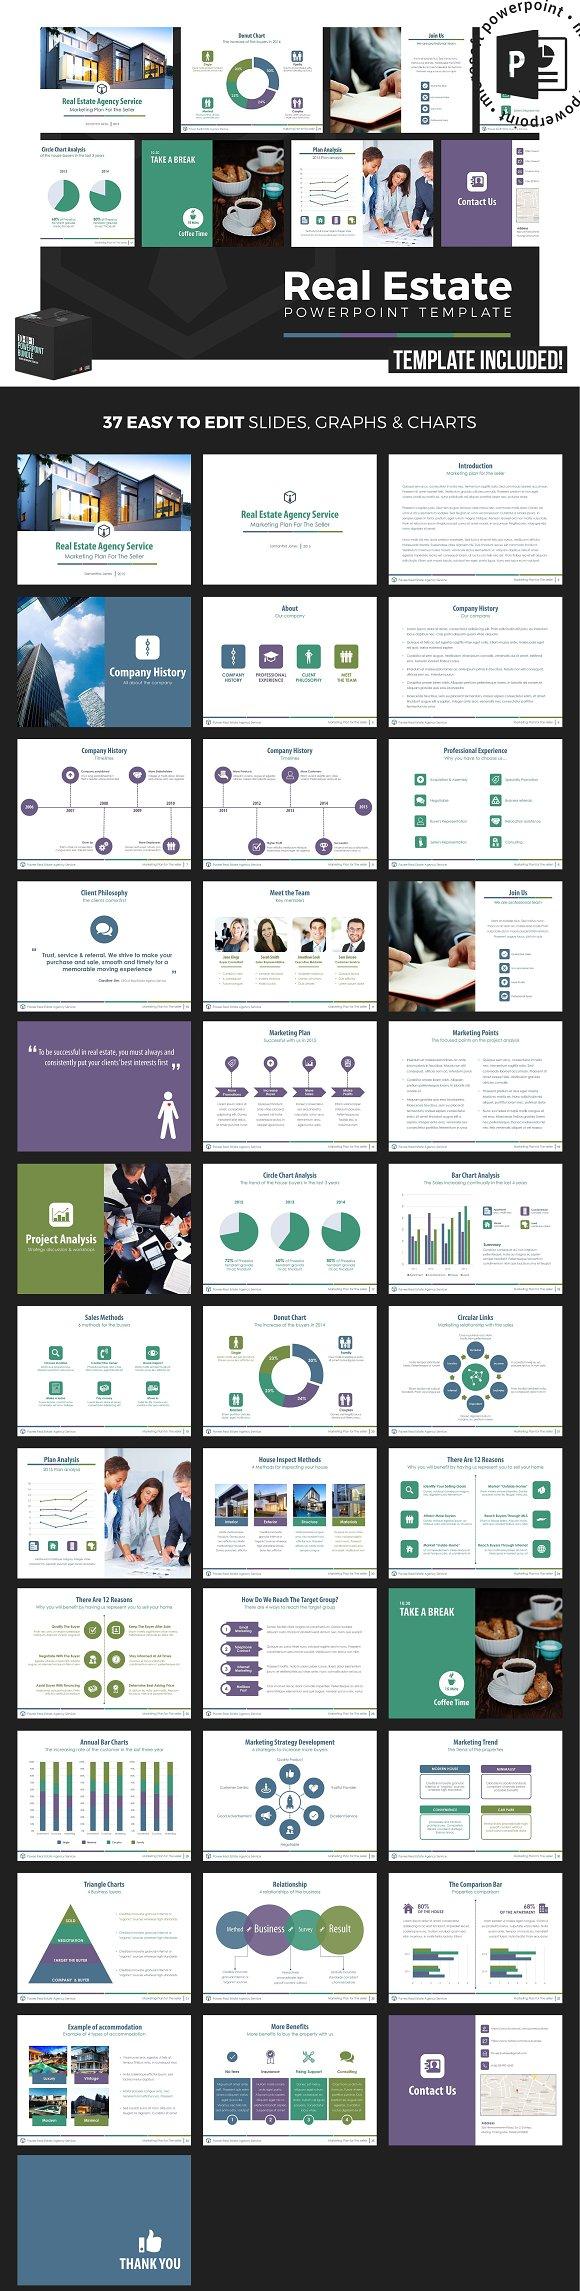 10-IN-1 PowerPoint Bundle